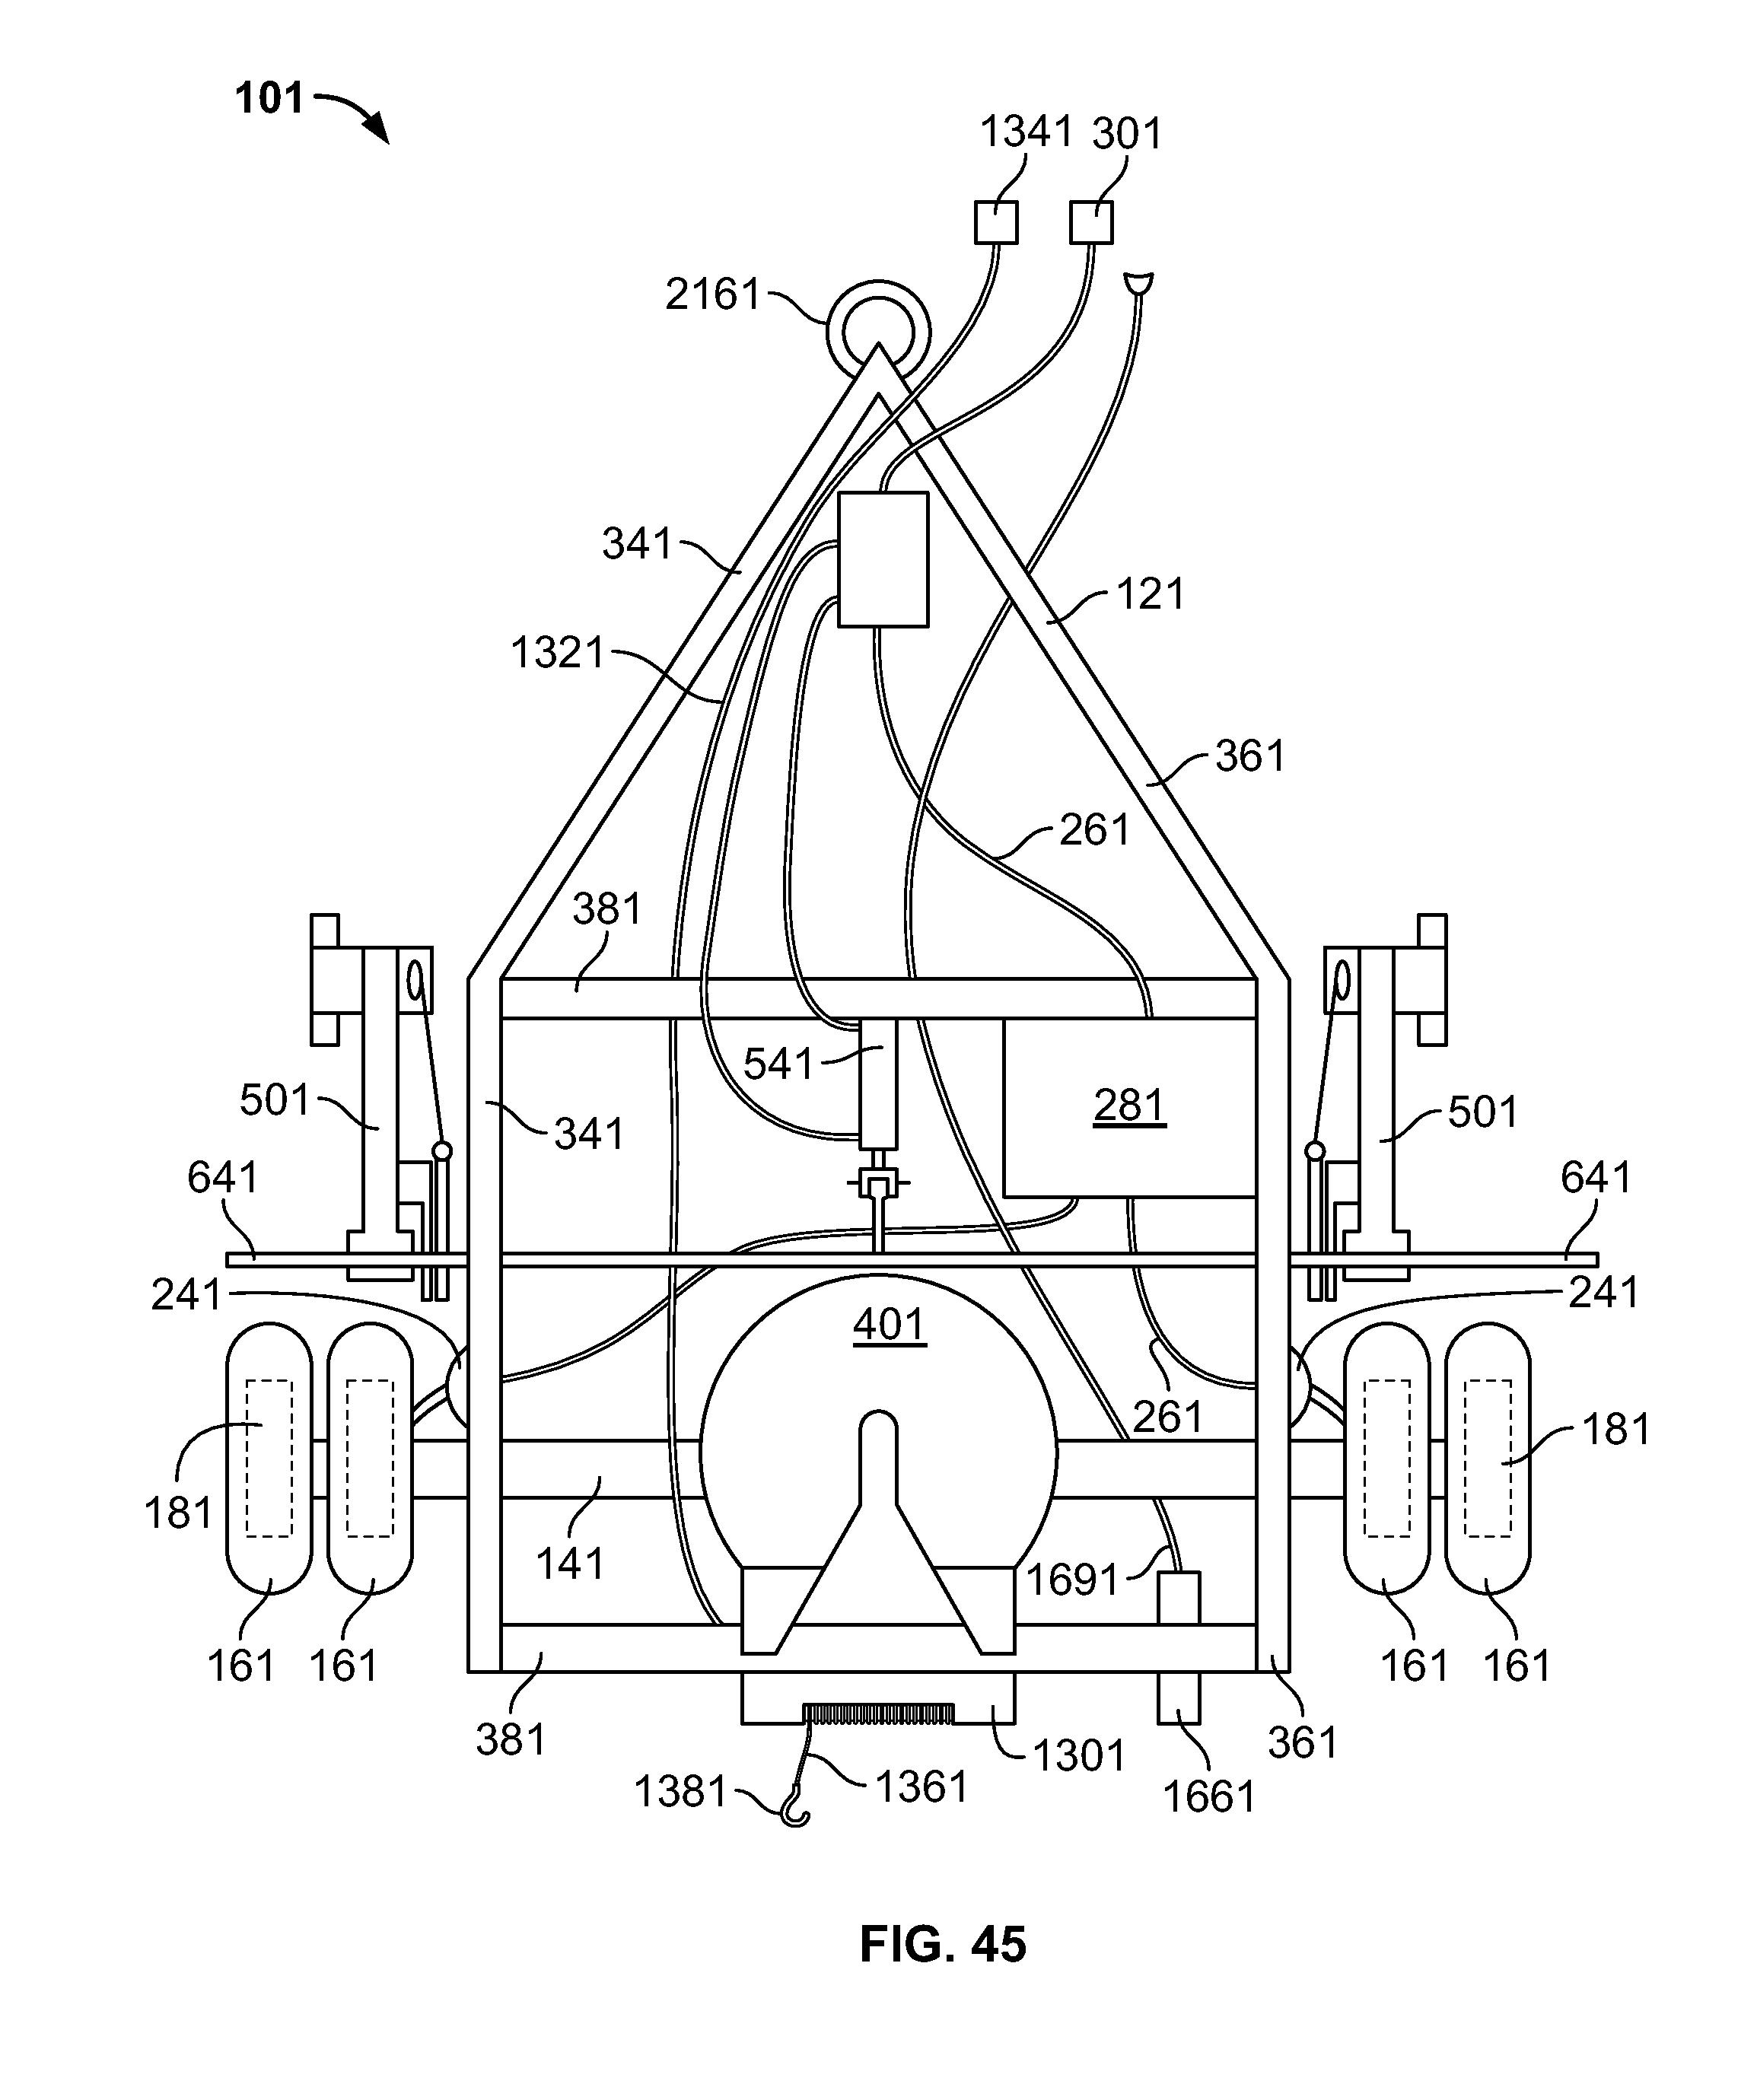 1066 International Wiring Diagram Control Tractor Lighting Get Free